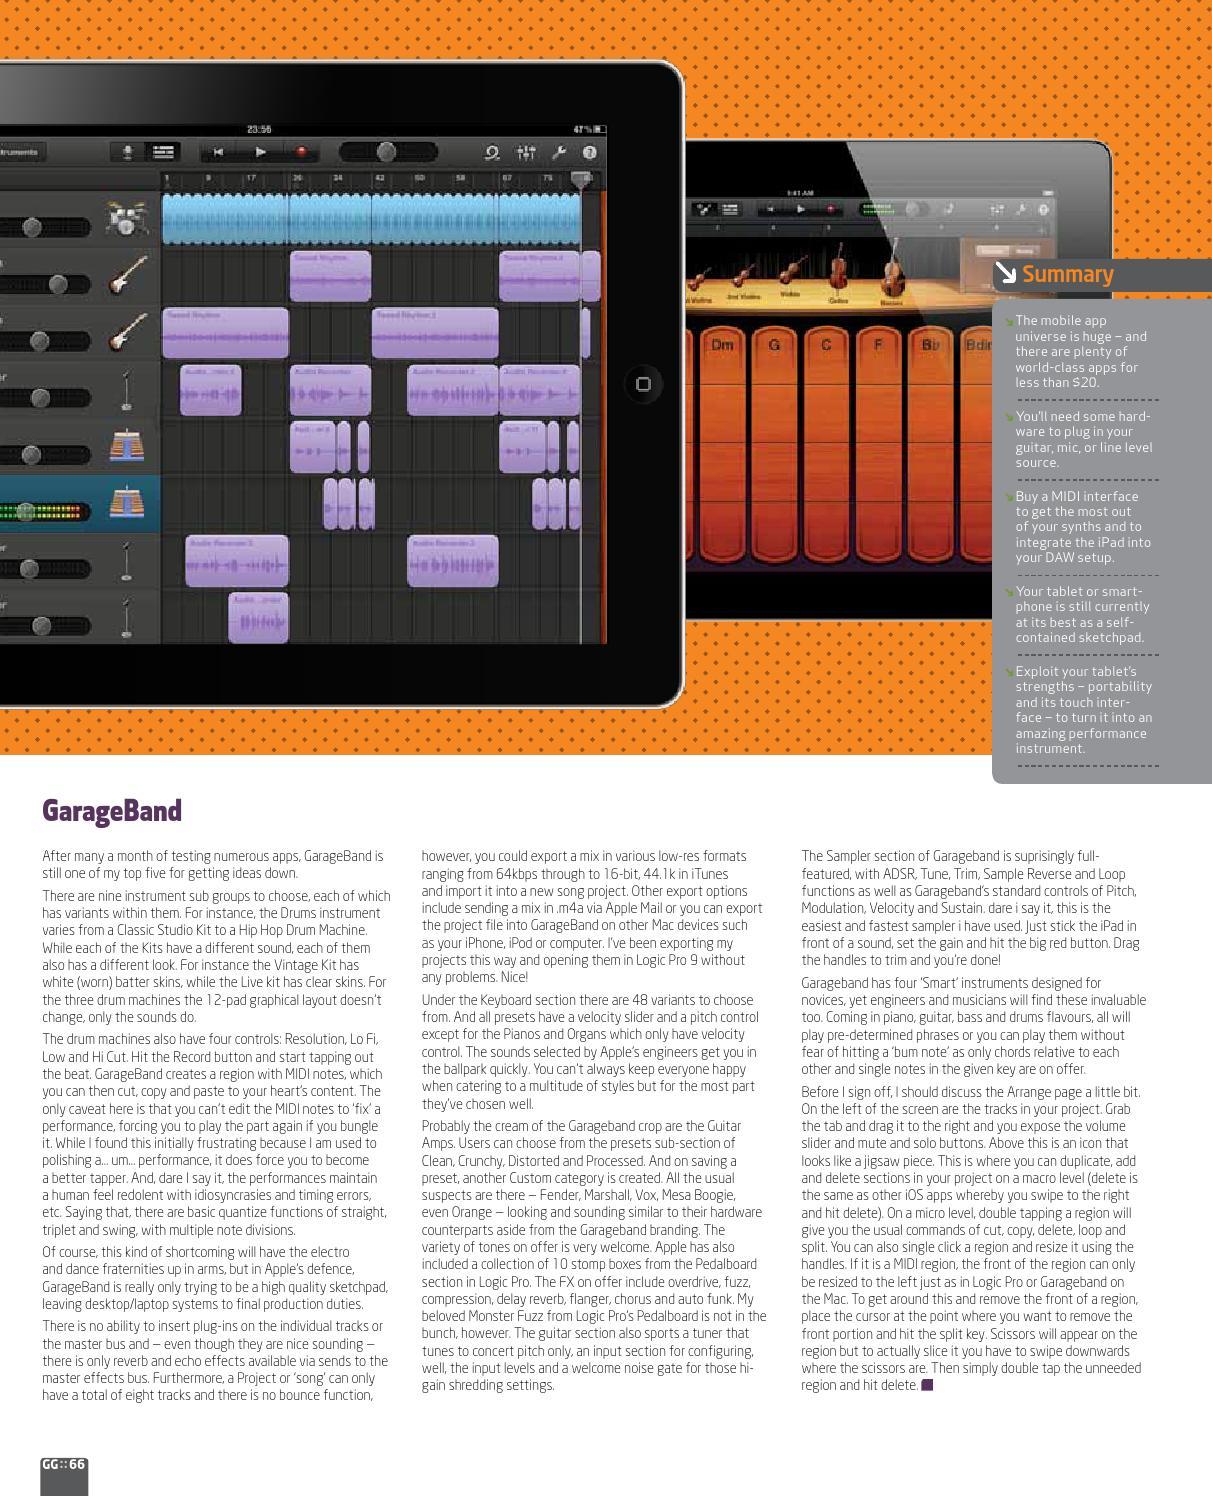 Guerrilla Guide Recording & Music Production 2013 by Alchemedia